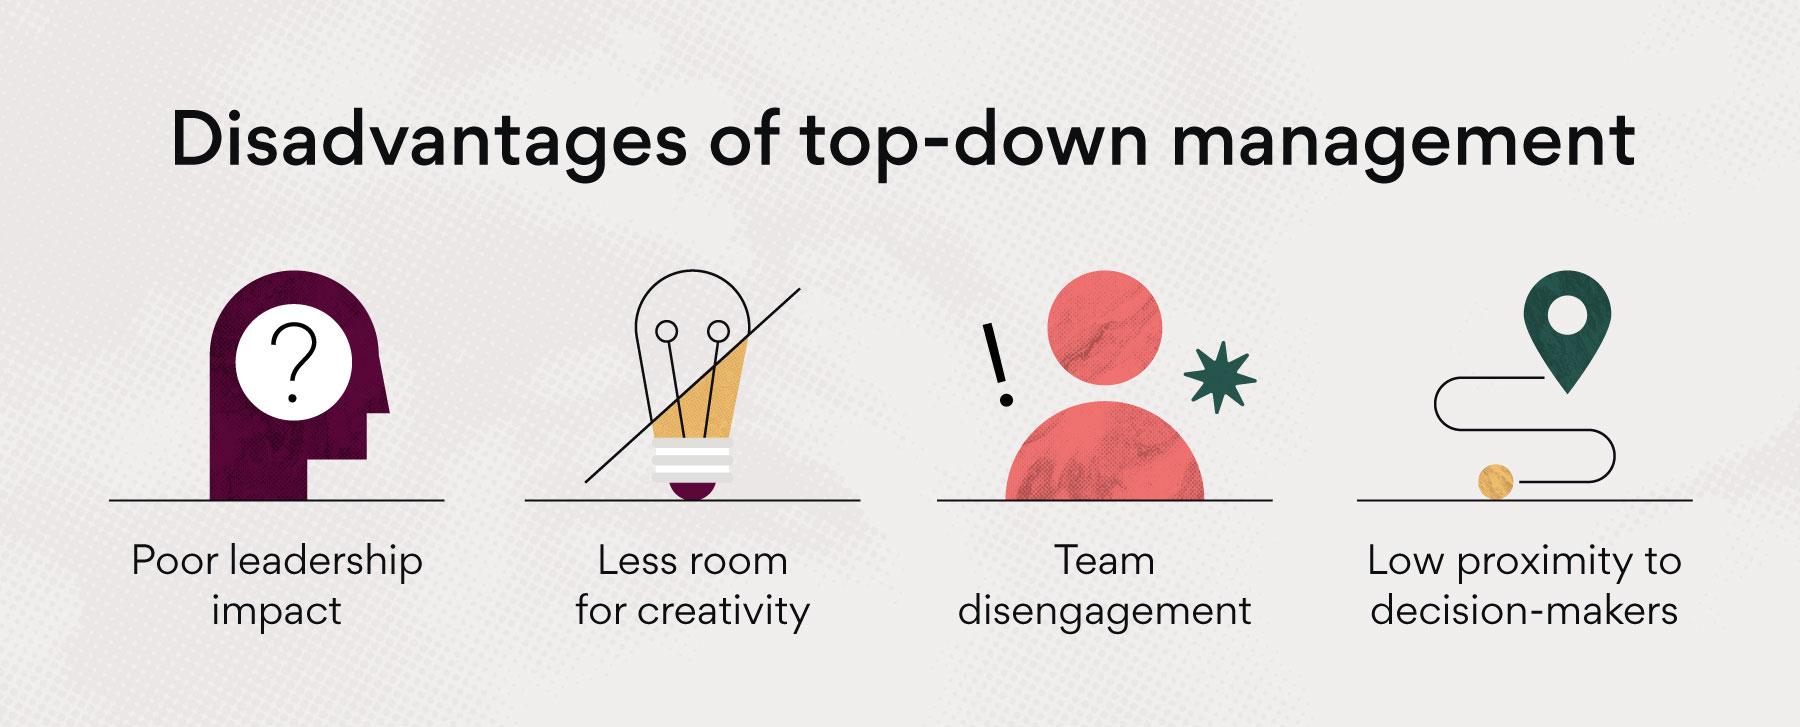 Disadvantages of top-down management